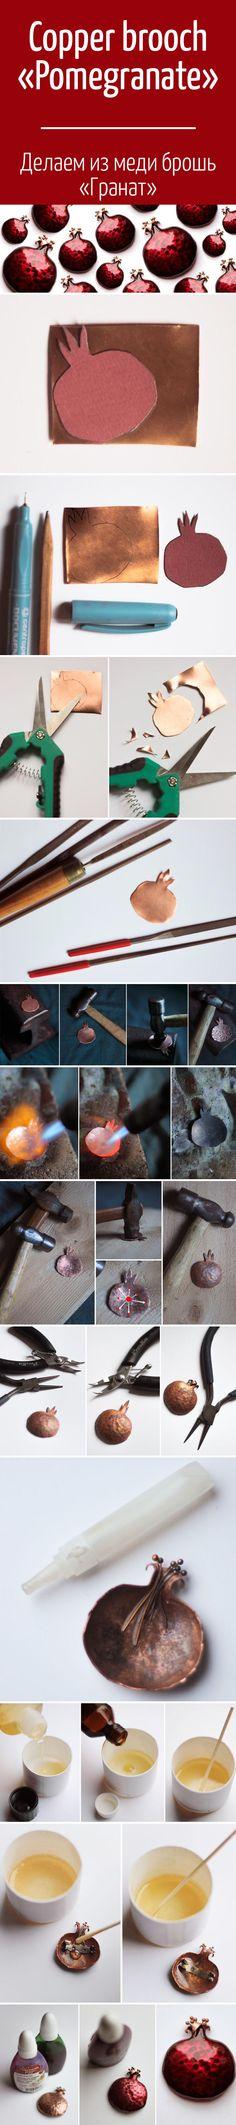 Copper brooch «Pomegranate» / Делаем из меди брошь «Гранат»